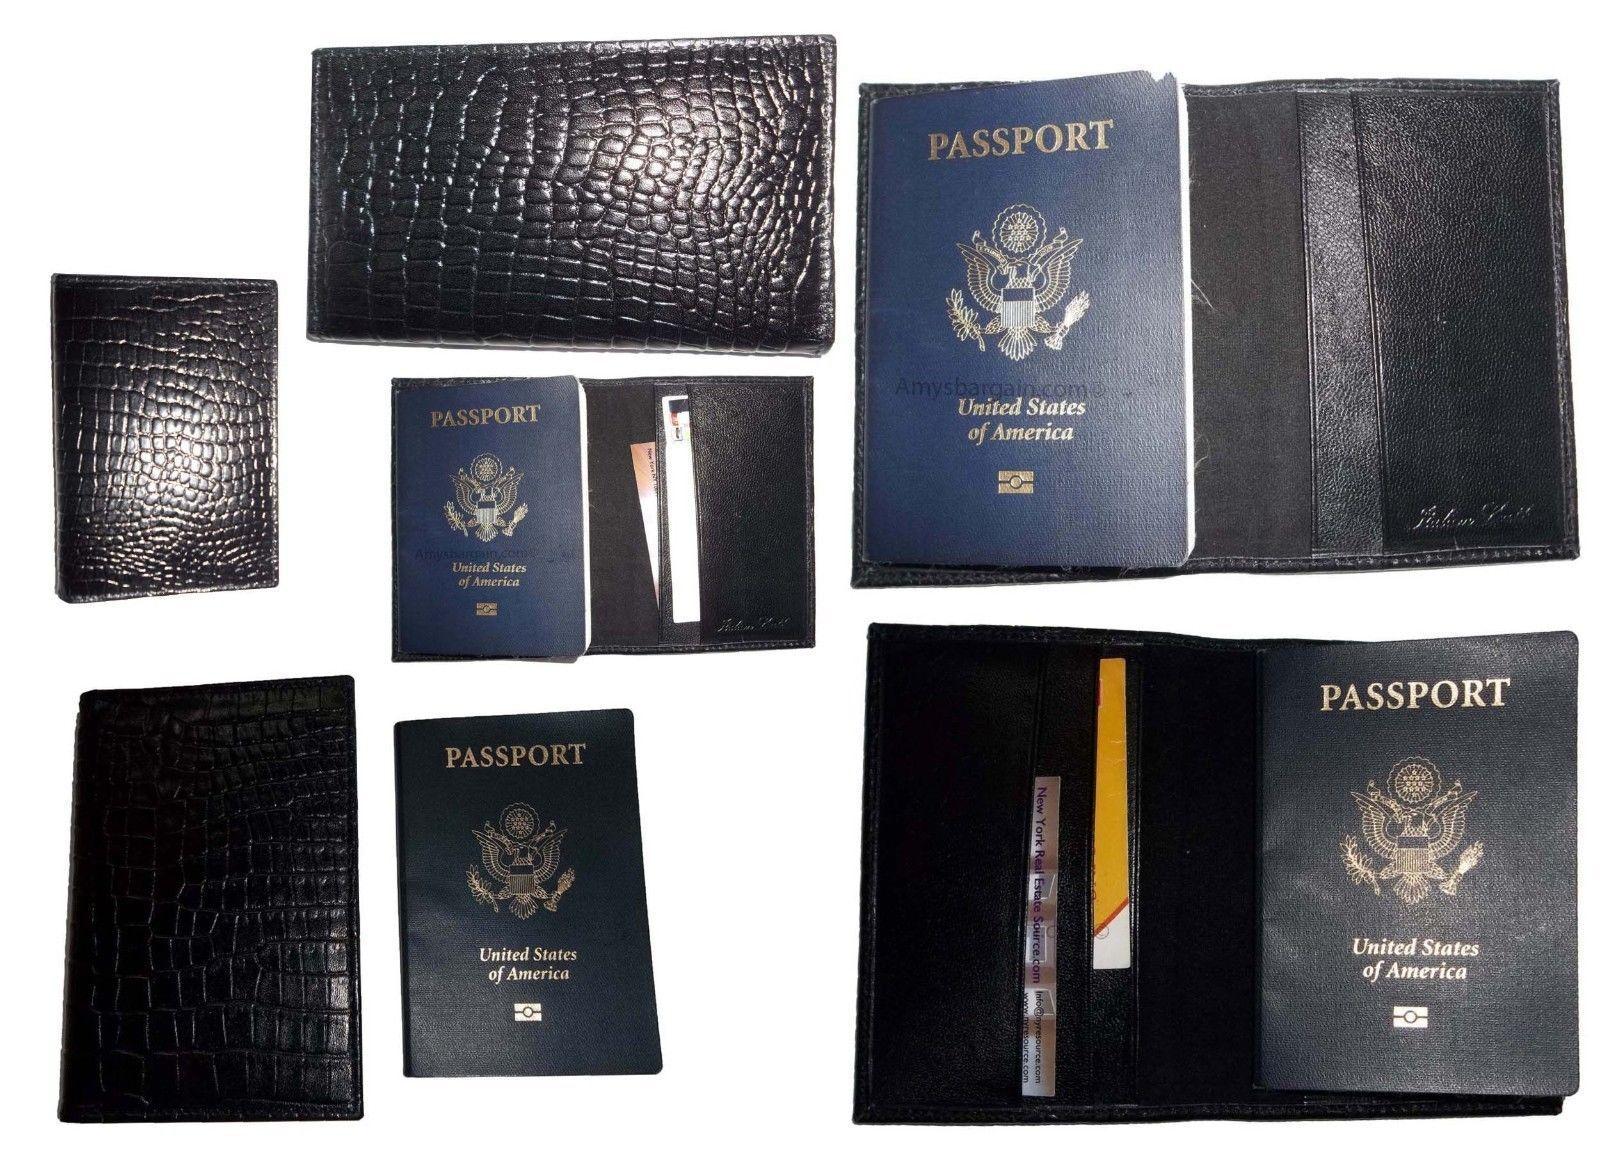 6 New Crocodile Imprimé Cuir Passport Portefeuille Etui Crédit Atm Carte Support